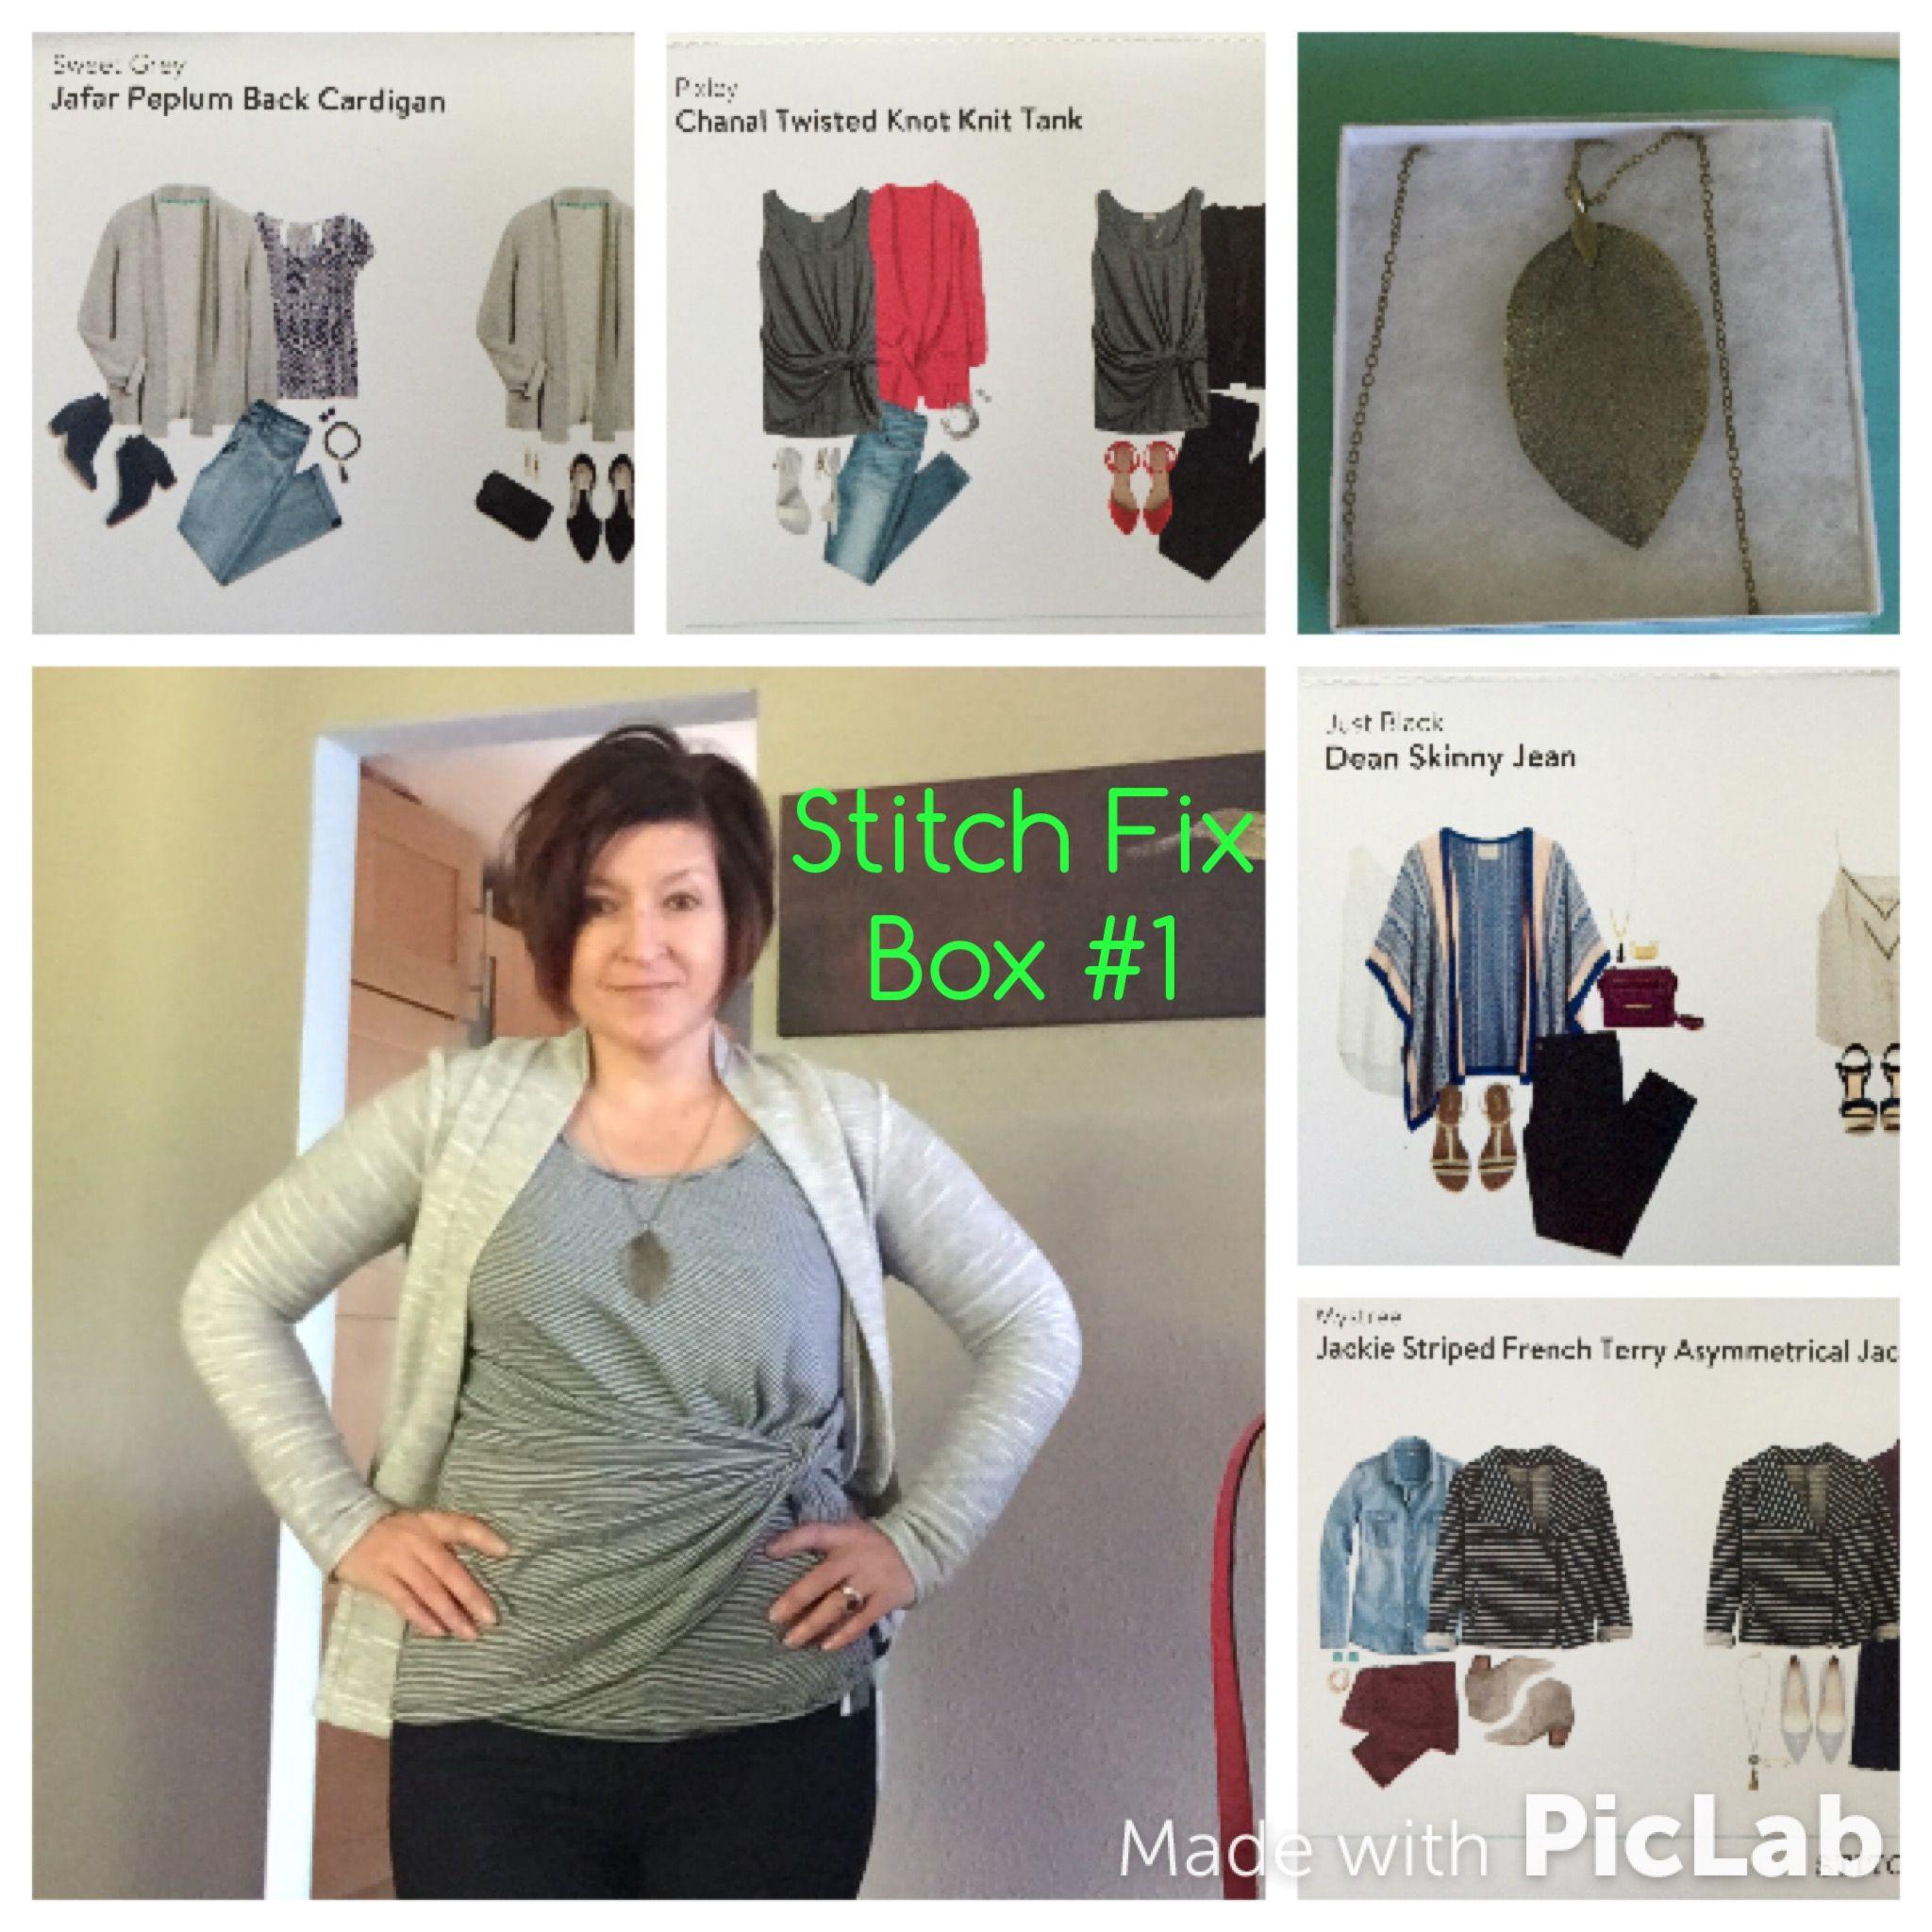 a481e75bd19b Stitch Fix Box  1  Sweet Grey Jafar Peplum Back Cardigan (Light Grey)   Pixley Chanal Twisted Knot Knit Tank (Black)  Zad Raya Pendant Necklace  (Antique ...